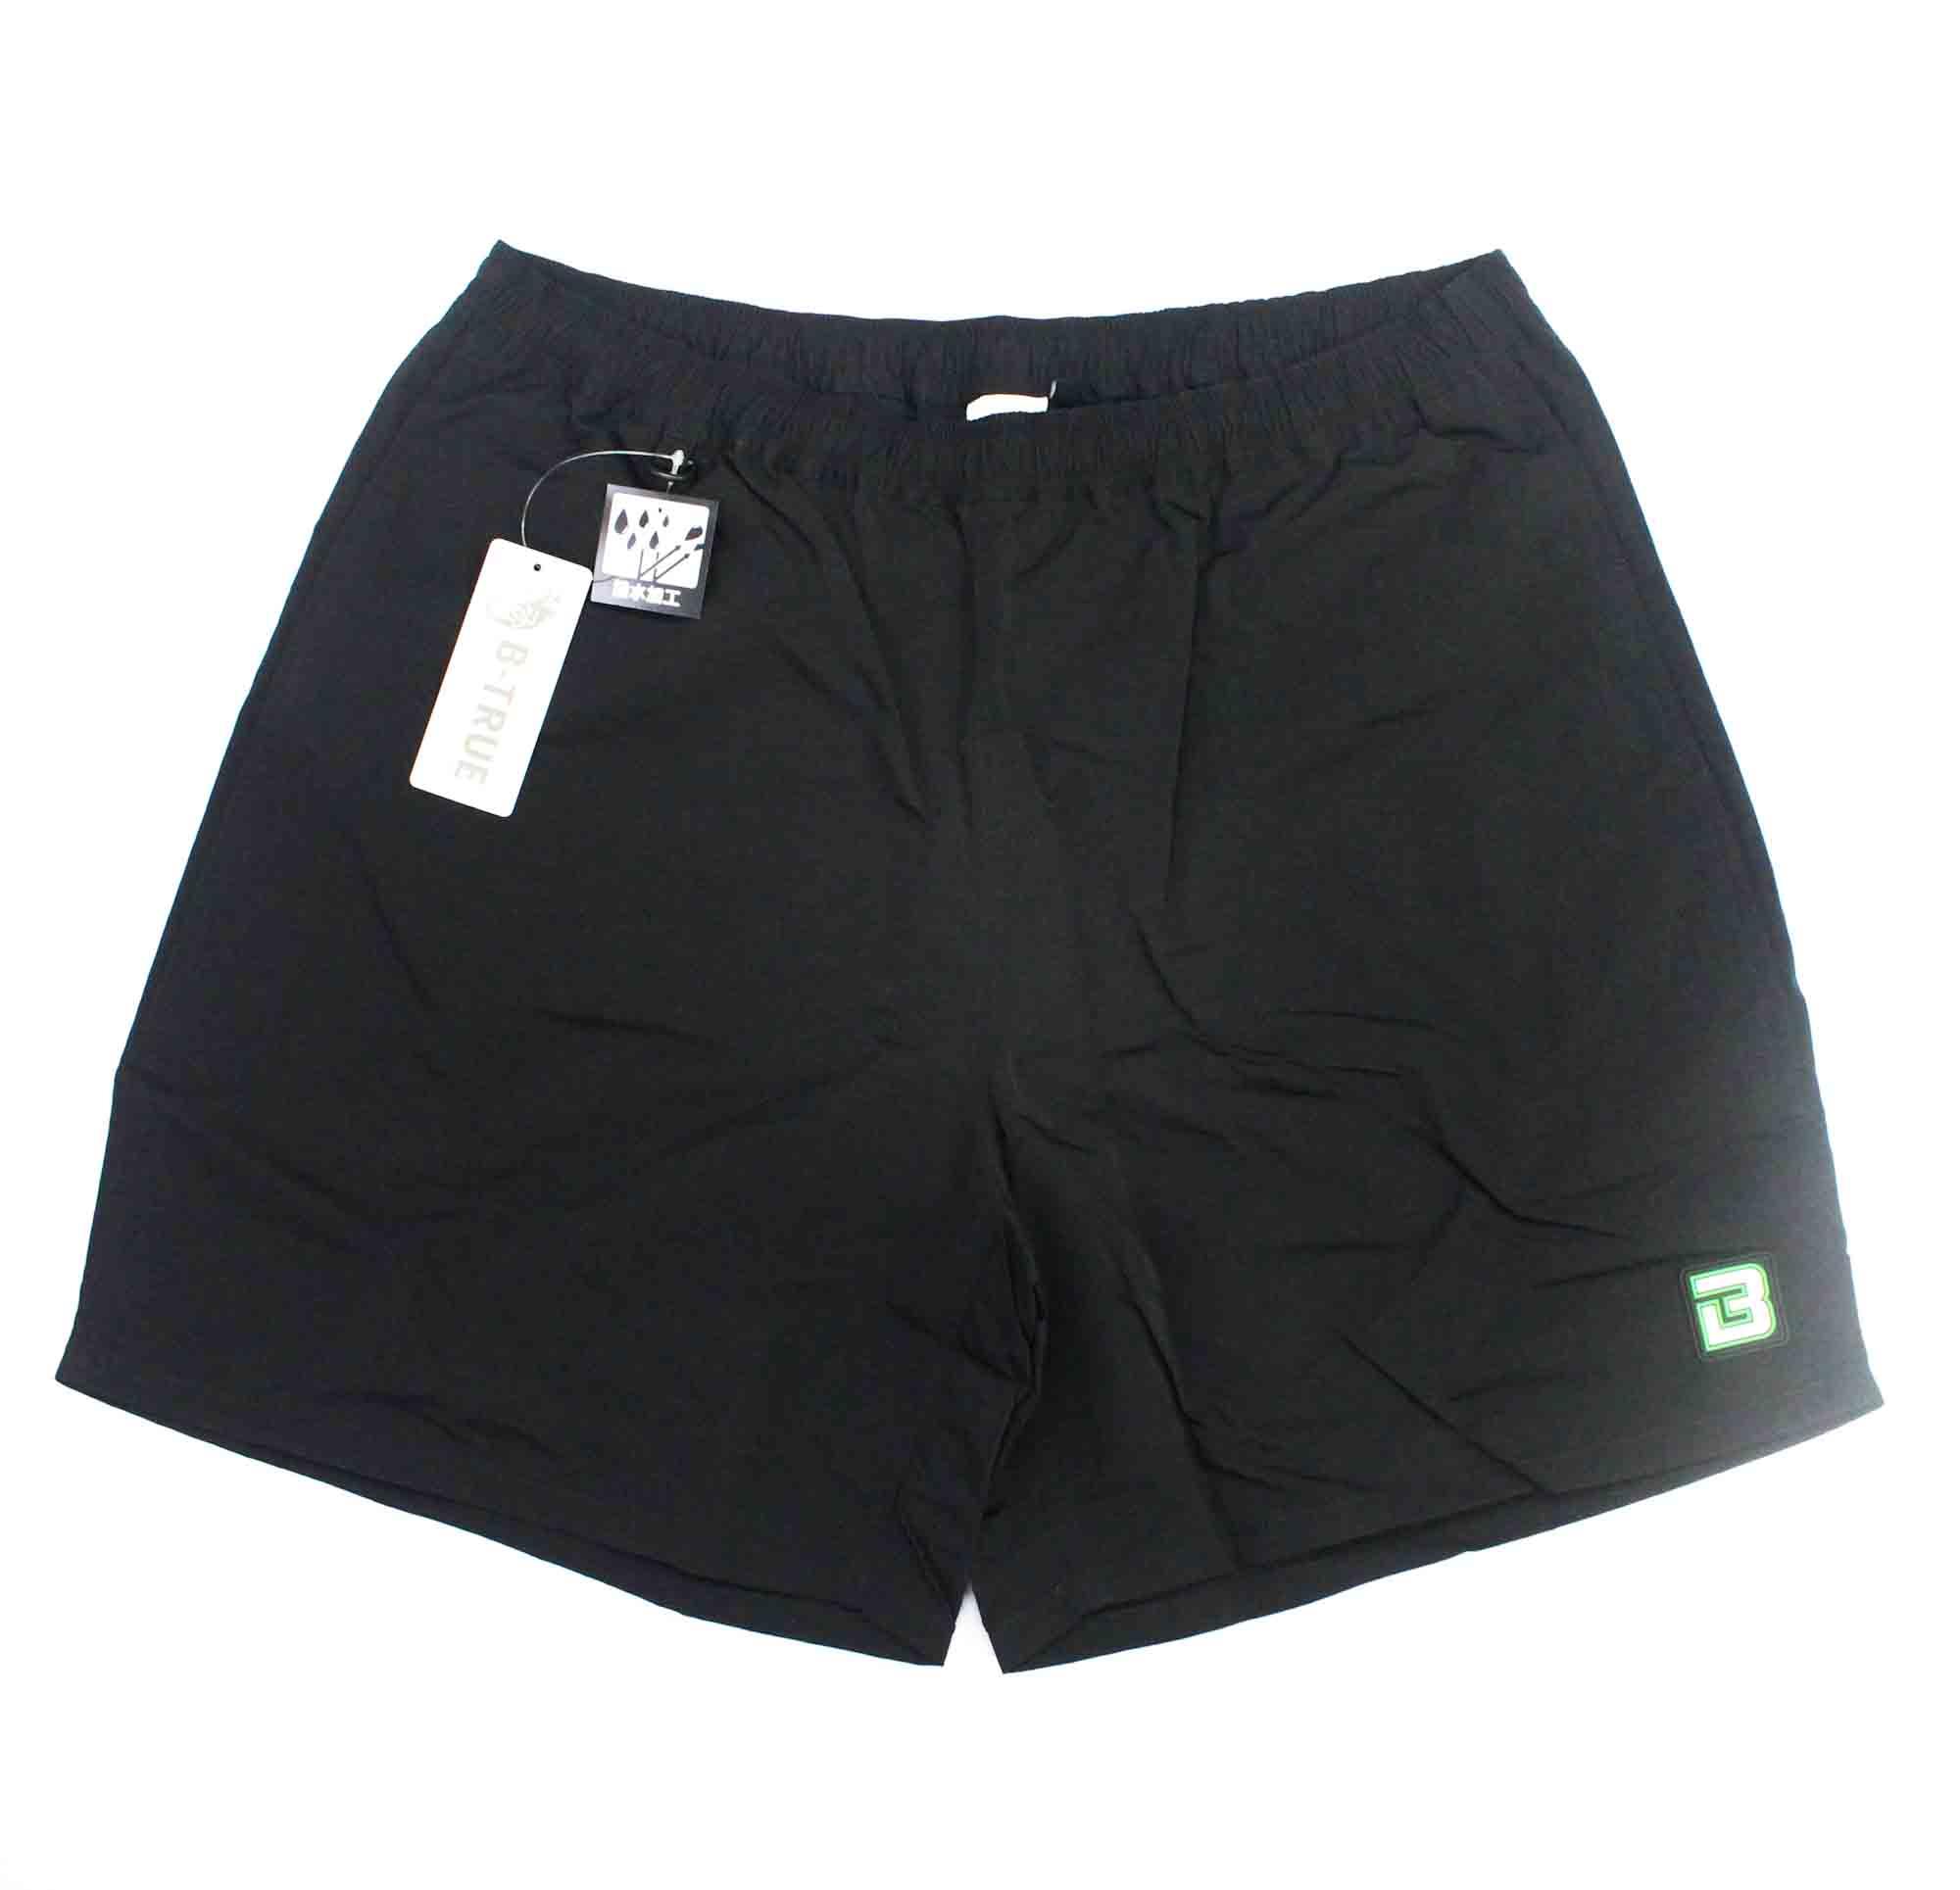 Evergreen Pants Shorts B True Size XL Black (1386)